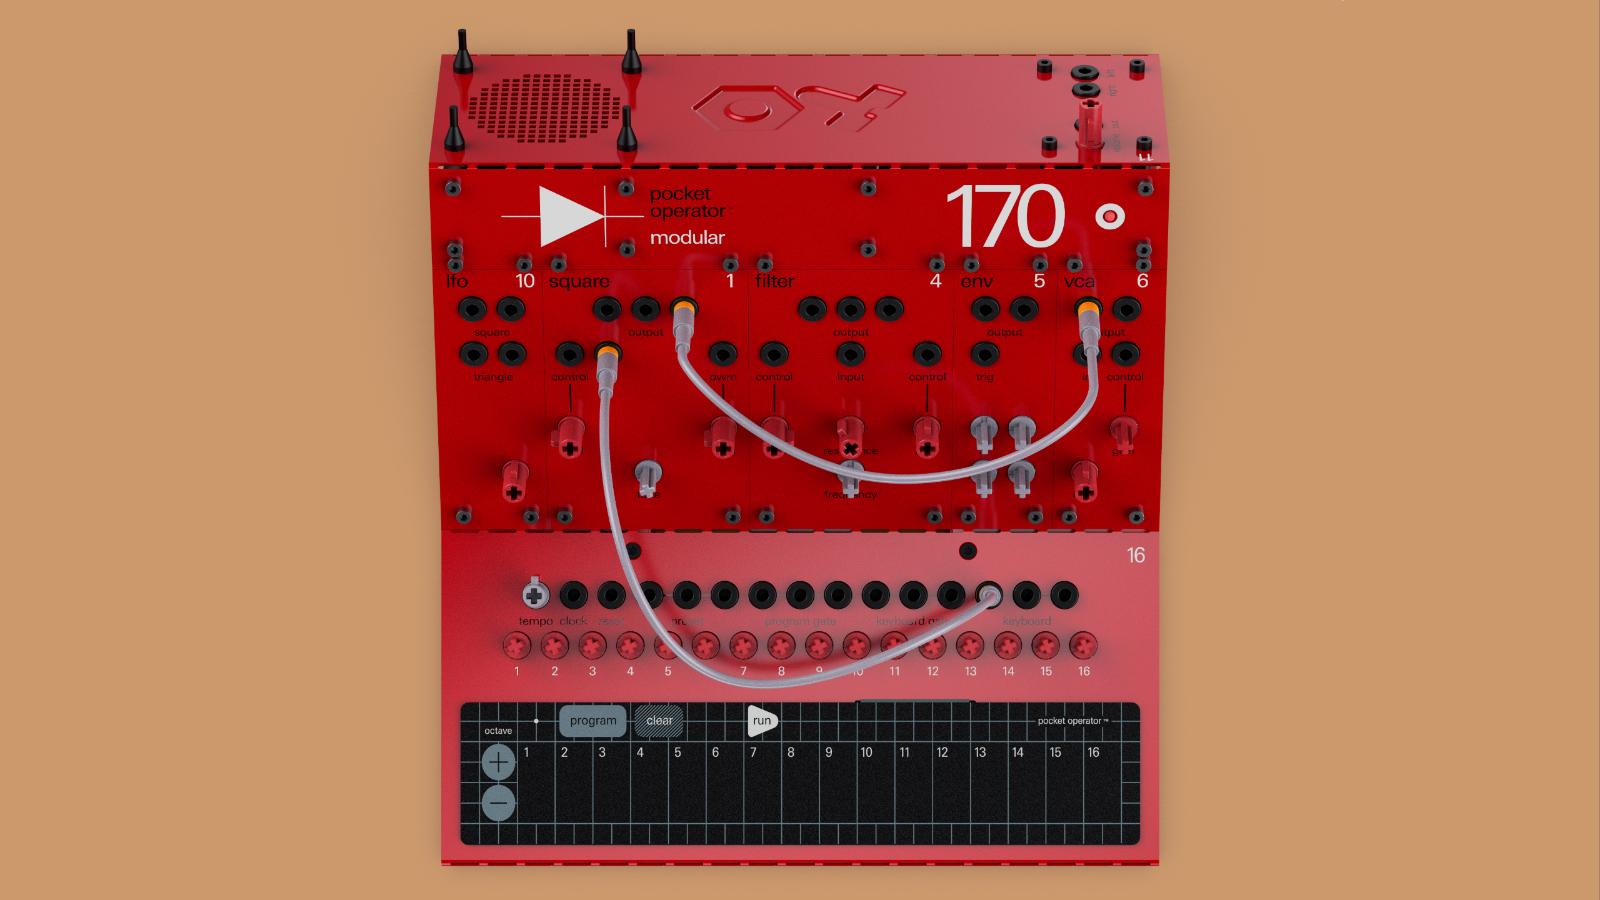 matrixsynth 3 teenage engineering modular synthesizer kits. Black Bedroom Furniture Sets. Home Design Ideas